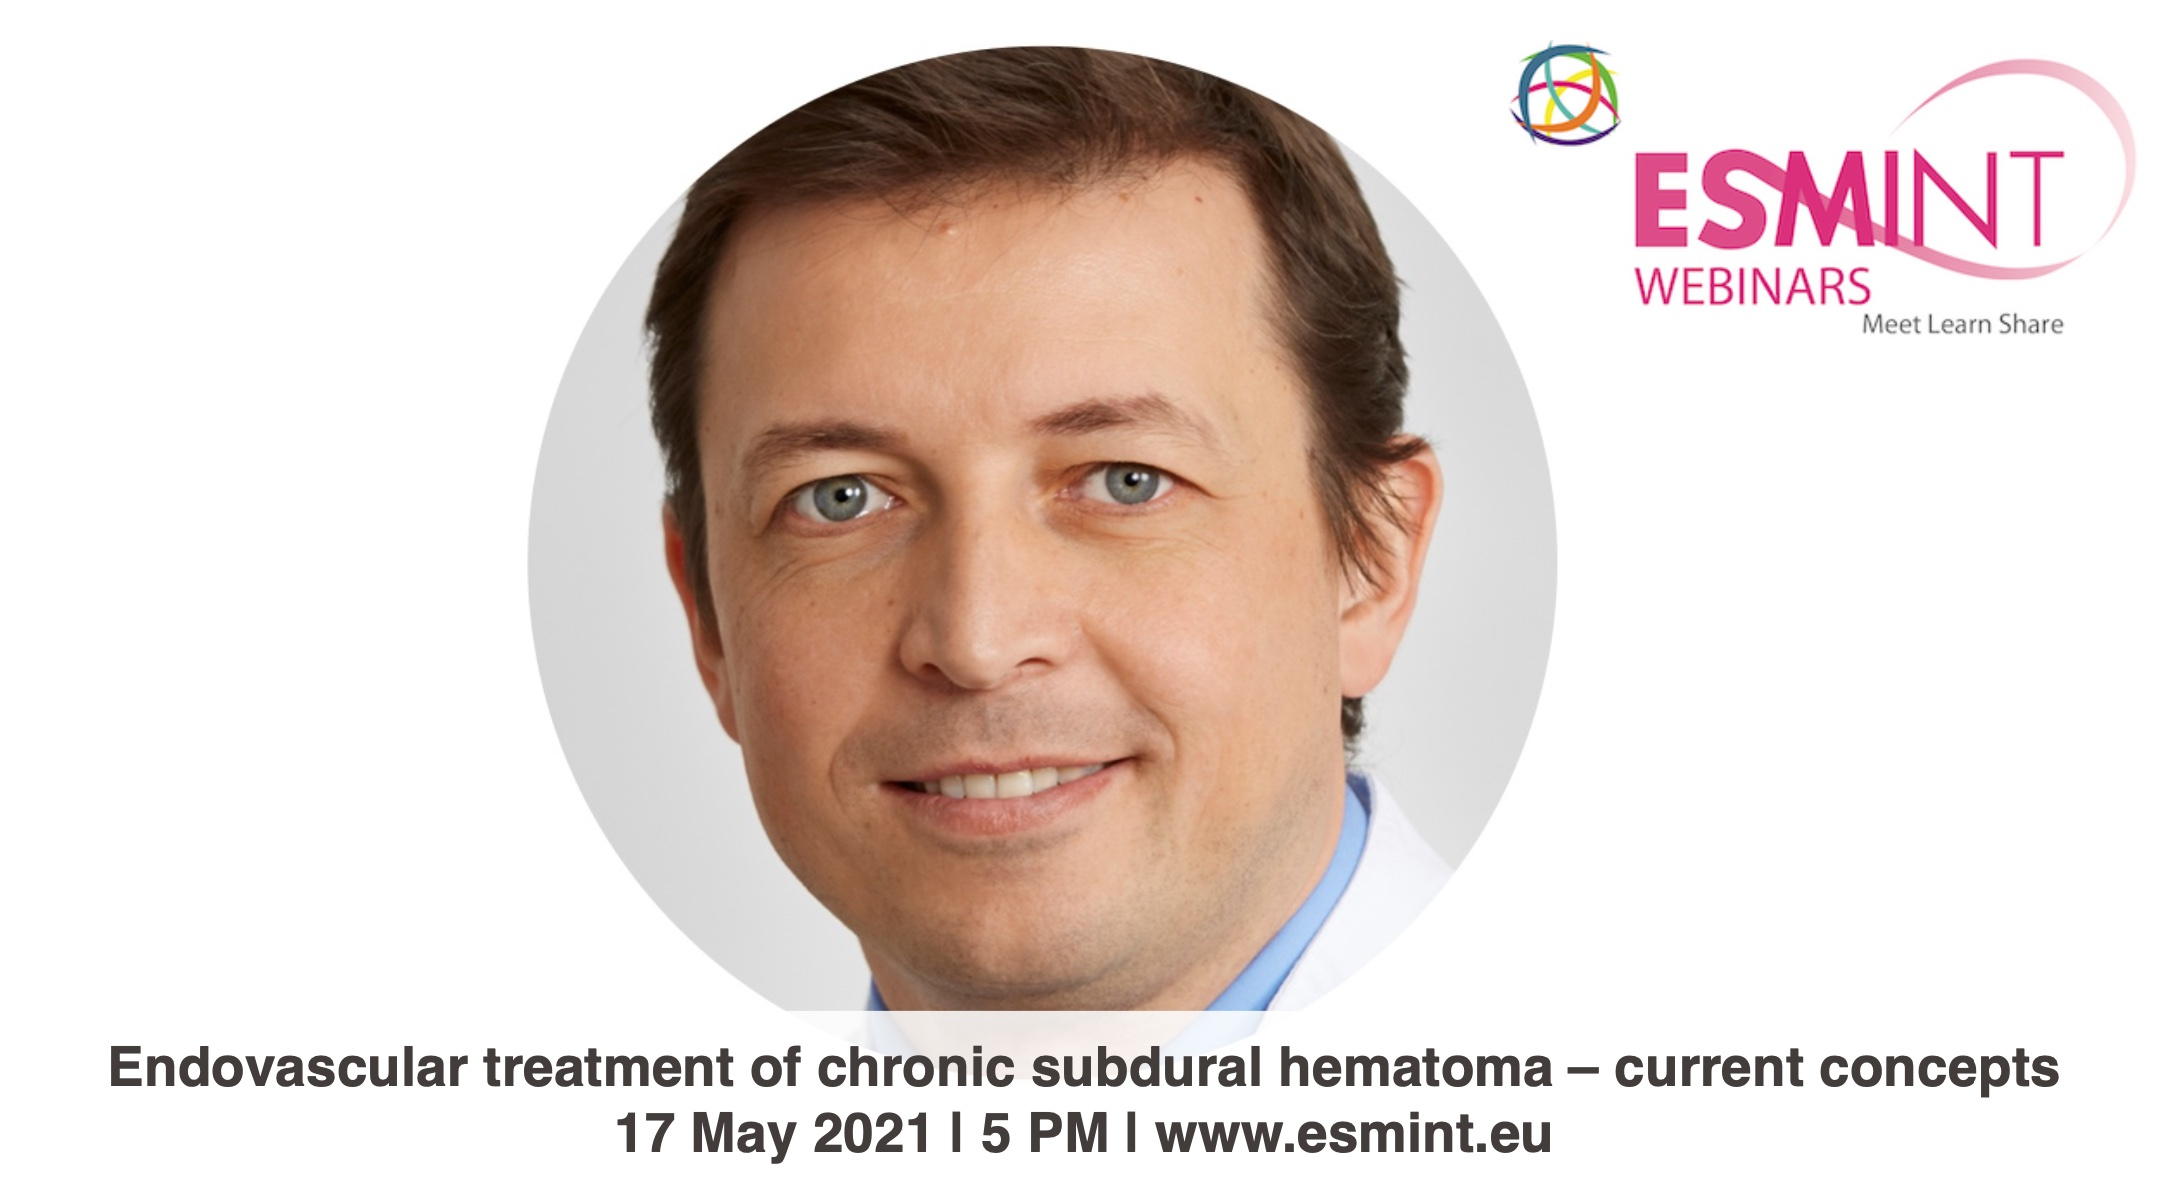 ESMINT Webinar with Zsolt Kulcsar about chronic subdural hematoma.